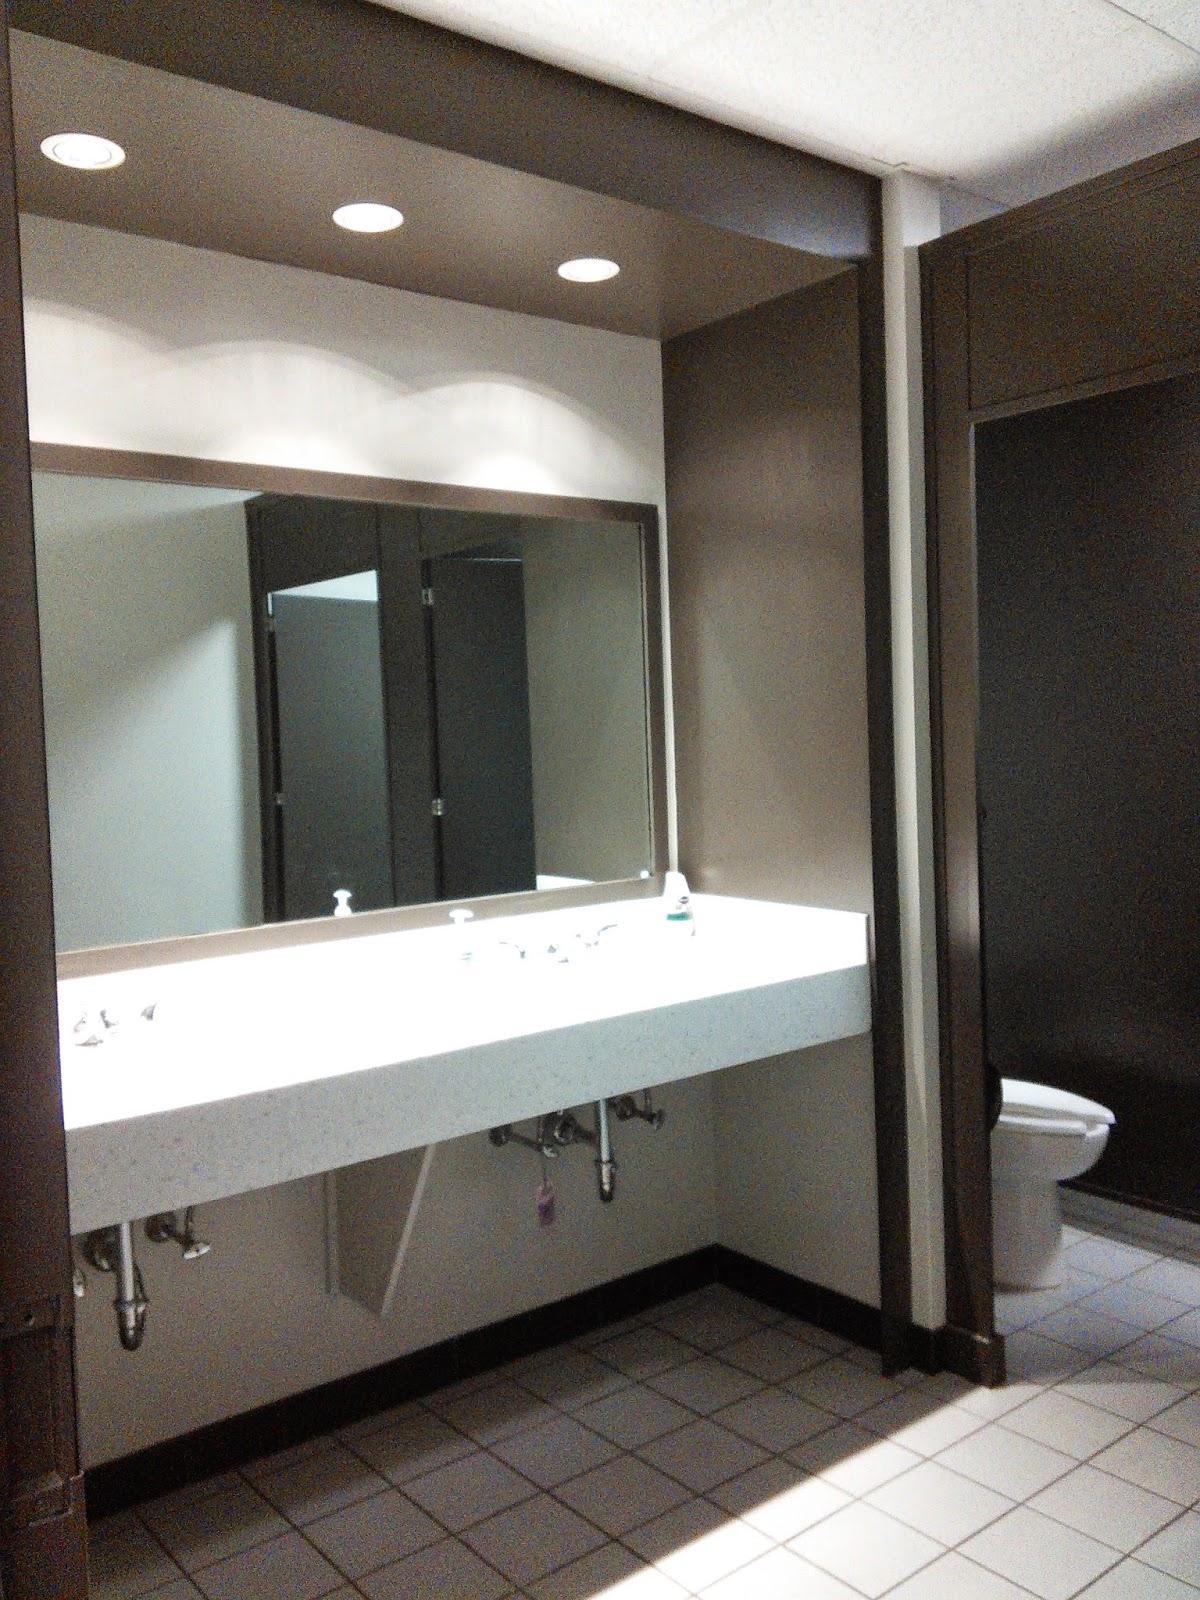 Amber Wilhelmina Pt Commercial Restroom Renovation - Commercial bathroom renovations